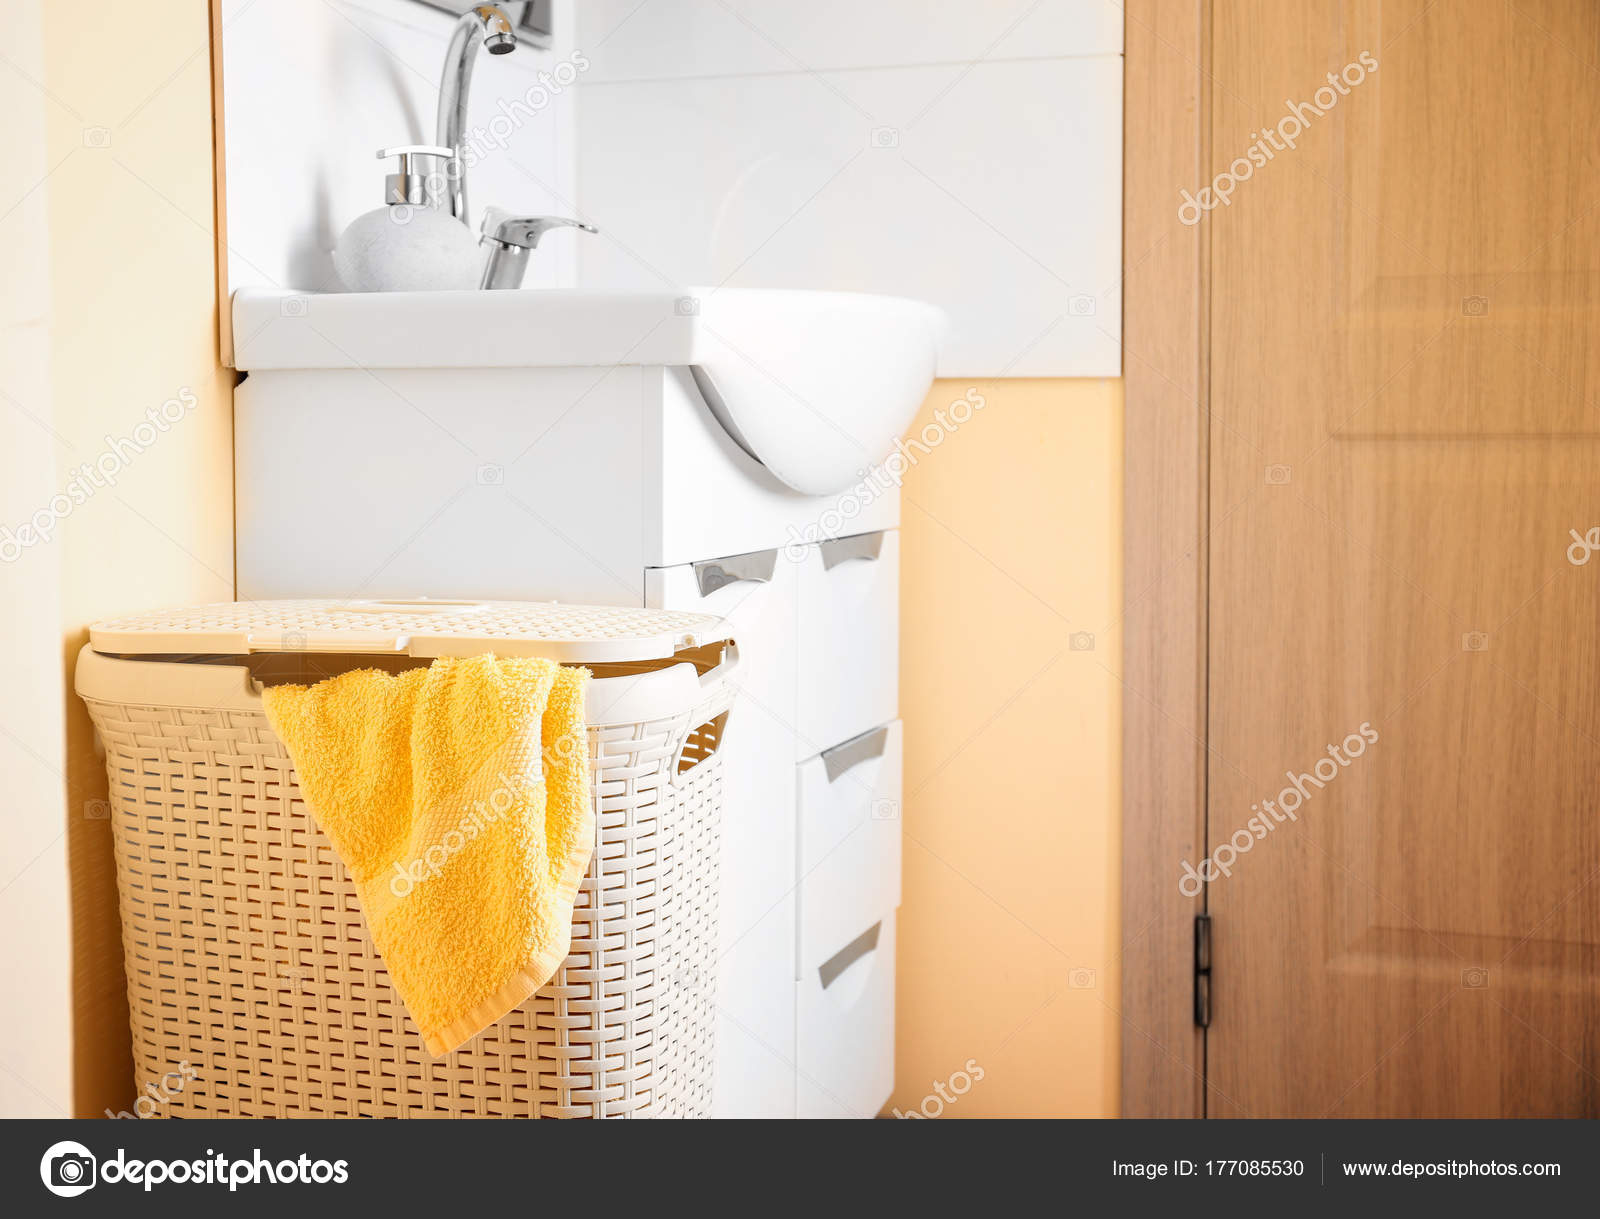 Ikea Badkamer Wasmanden : Relaxdays wasmand met 3 planken bamboe hout badkamermeubel badkamer